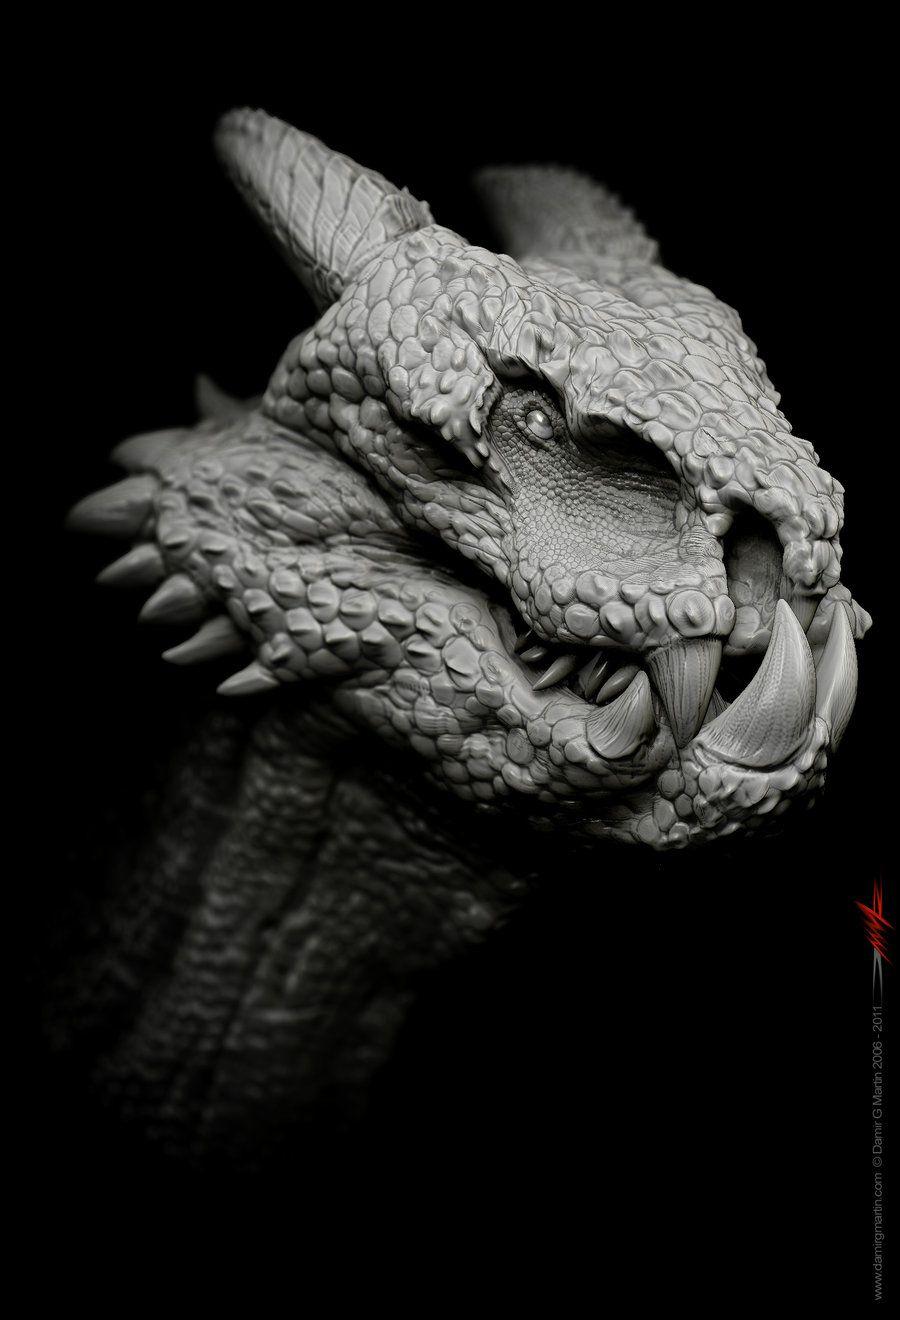 Dragon design 16 by damir-g-martin.deviantart.com